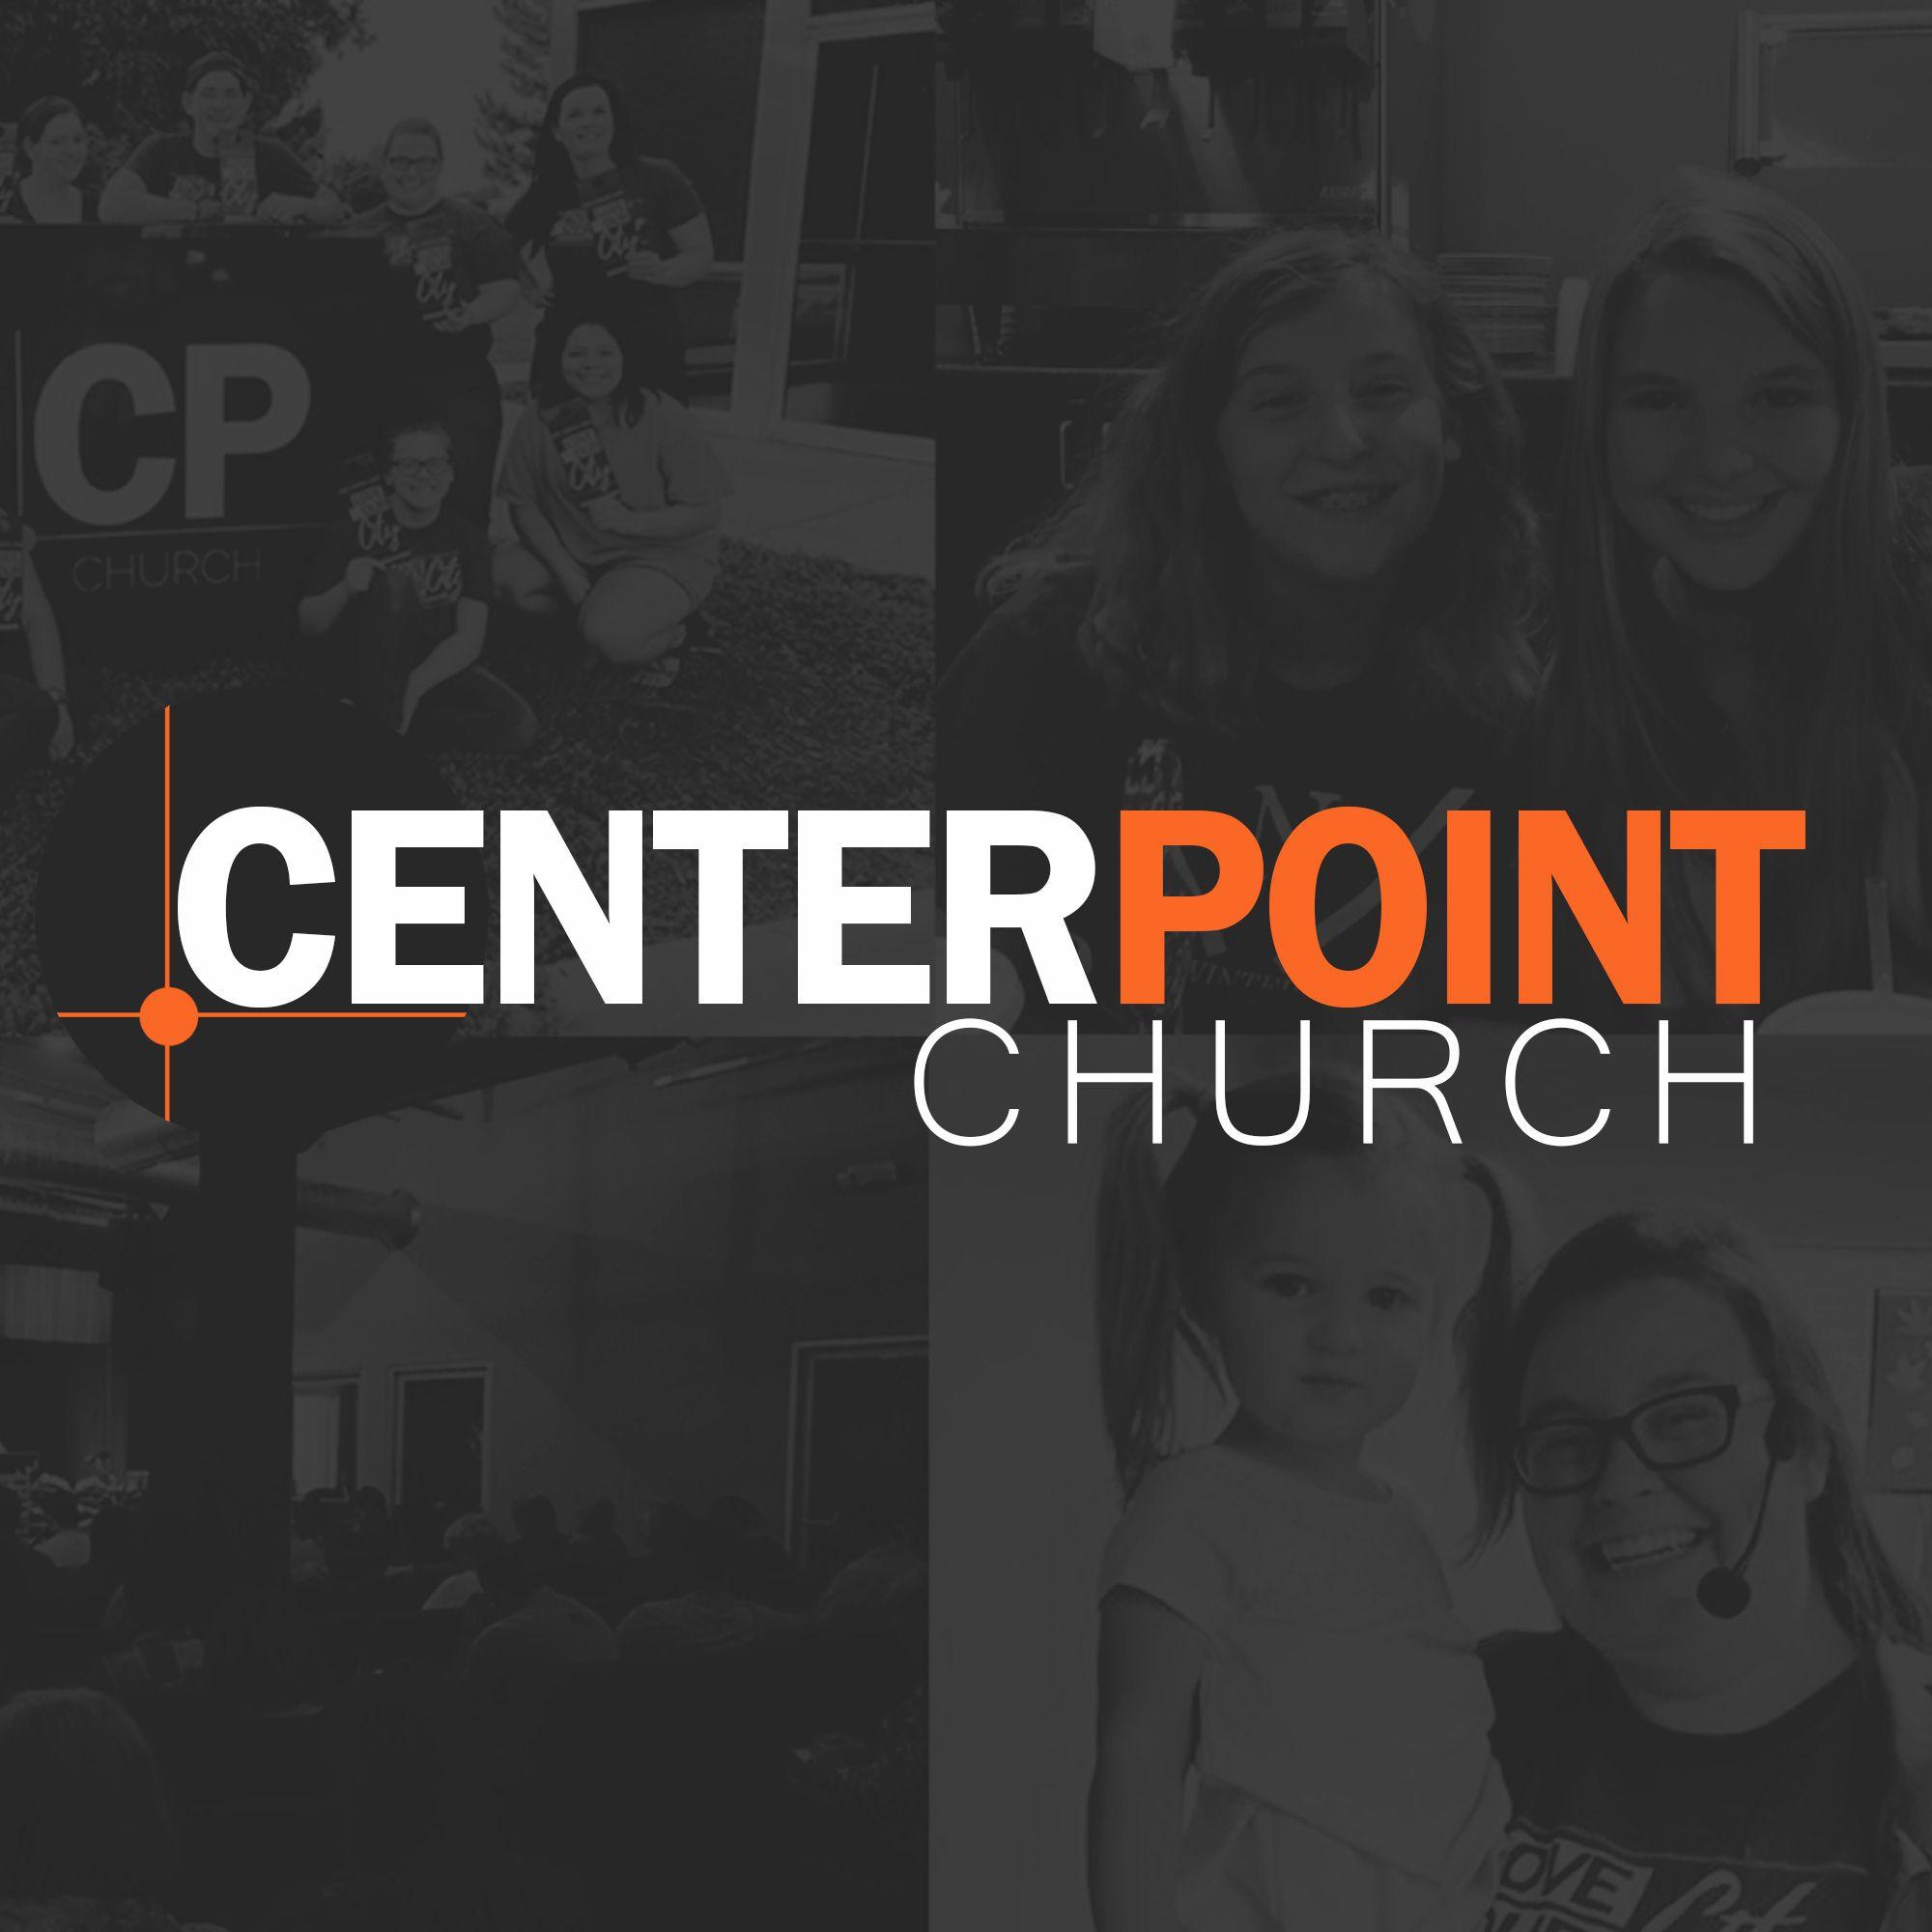 2019-11-17 - Pastor Brian Clark - Life in Emojis - Part 3